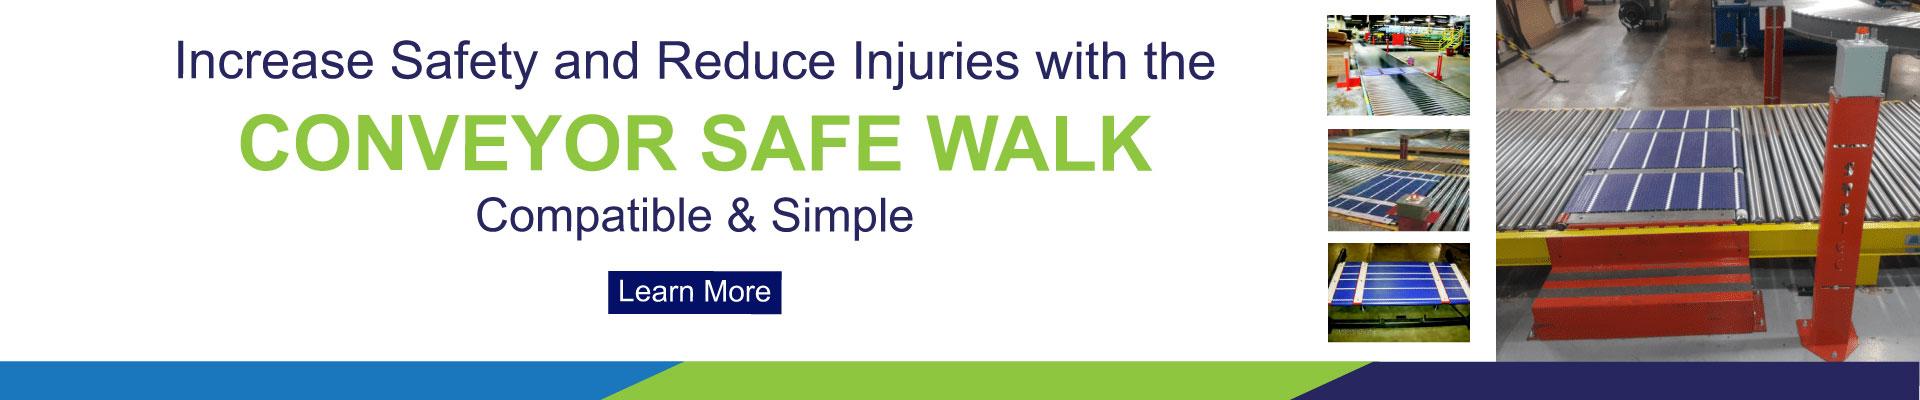 September Safewalk Banner